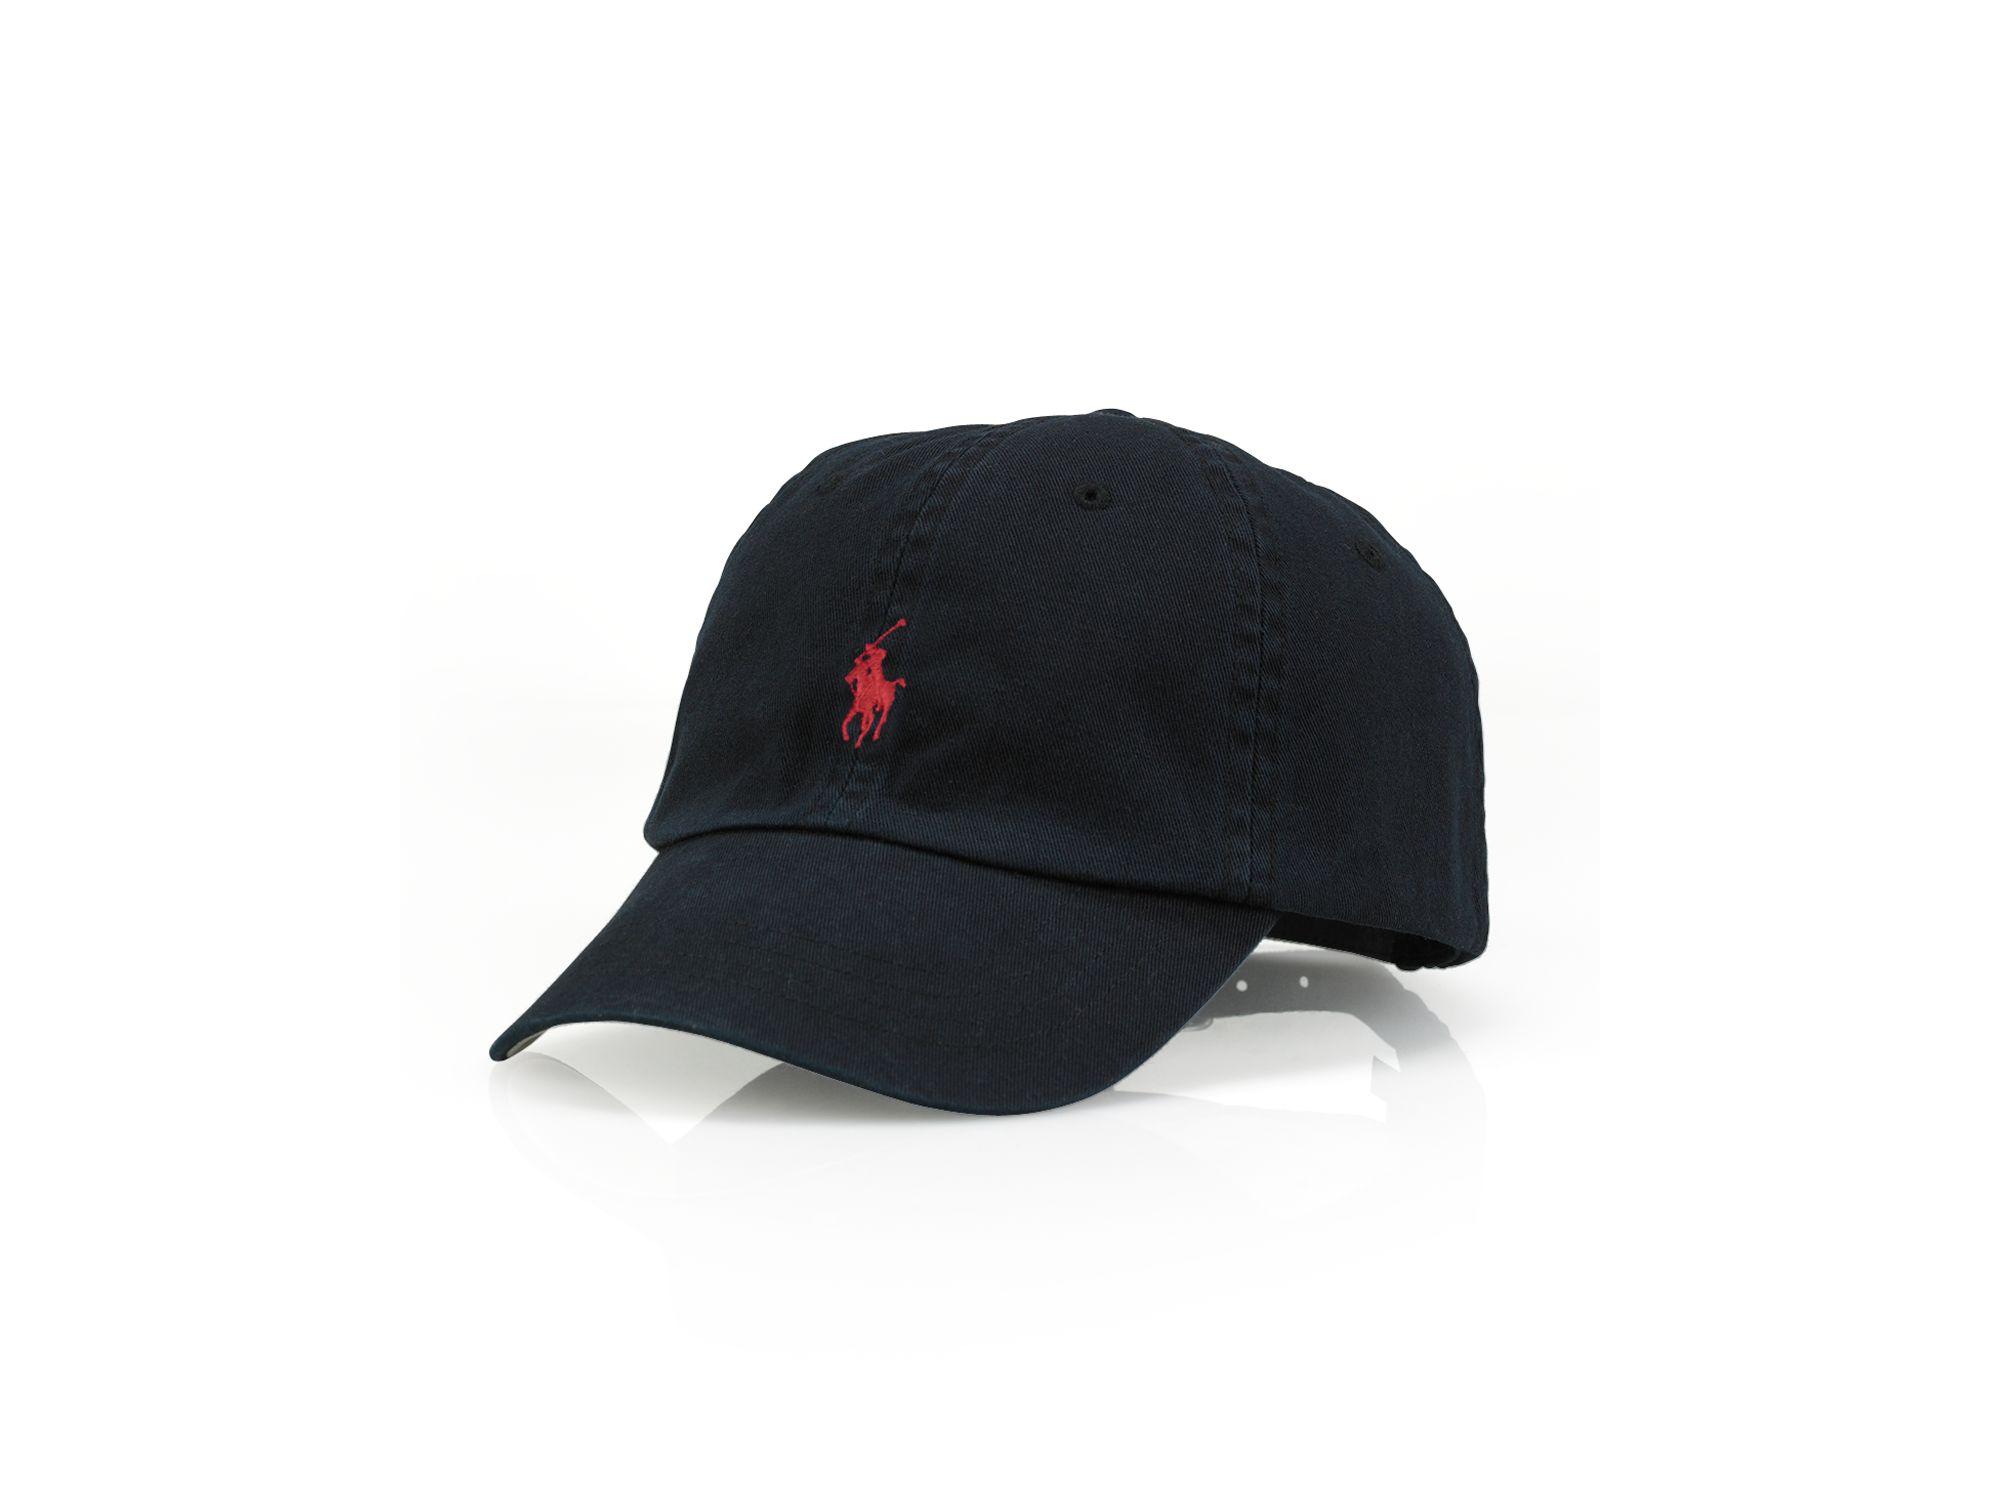 Ralph Lauren Polo Signature Pony Hat In Black For Men Lyst